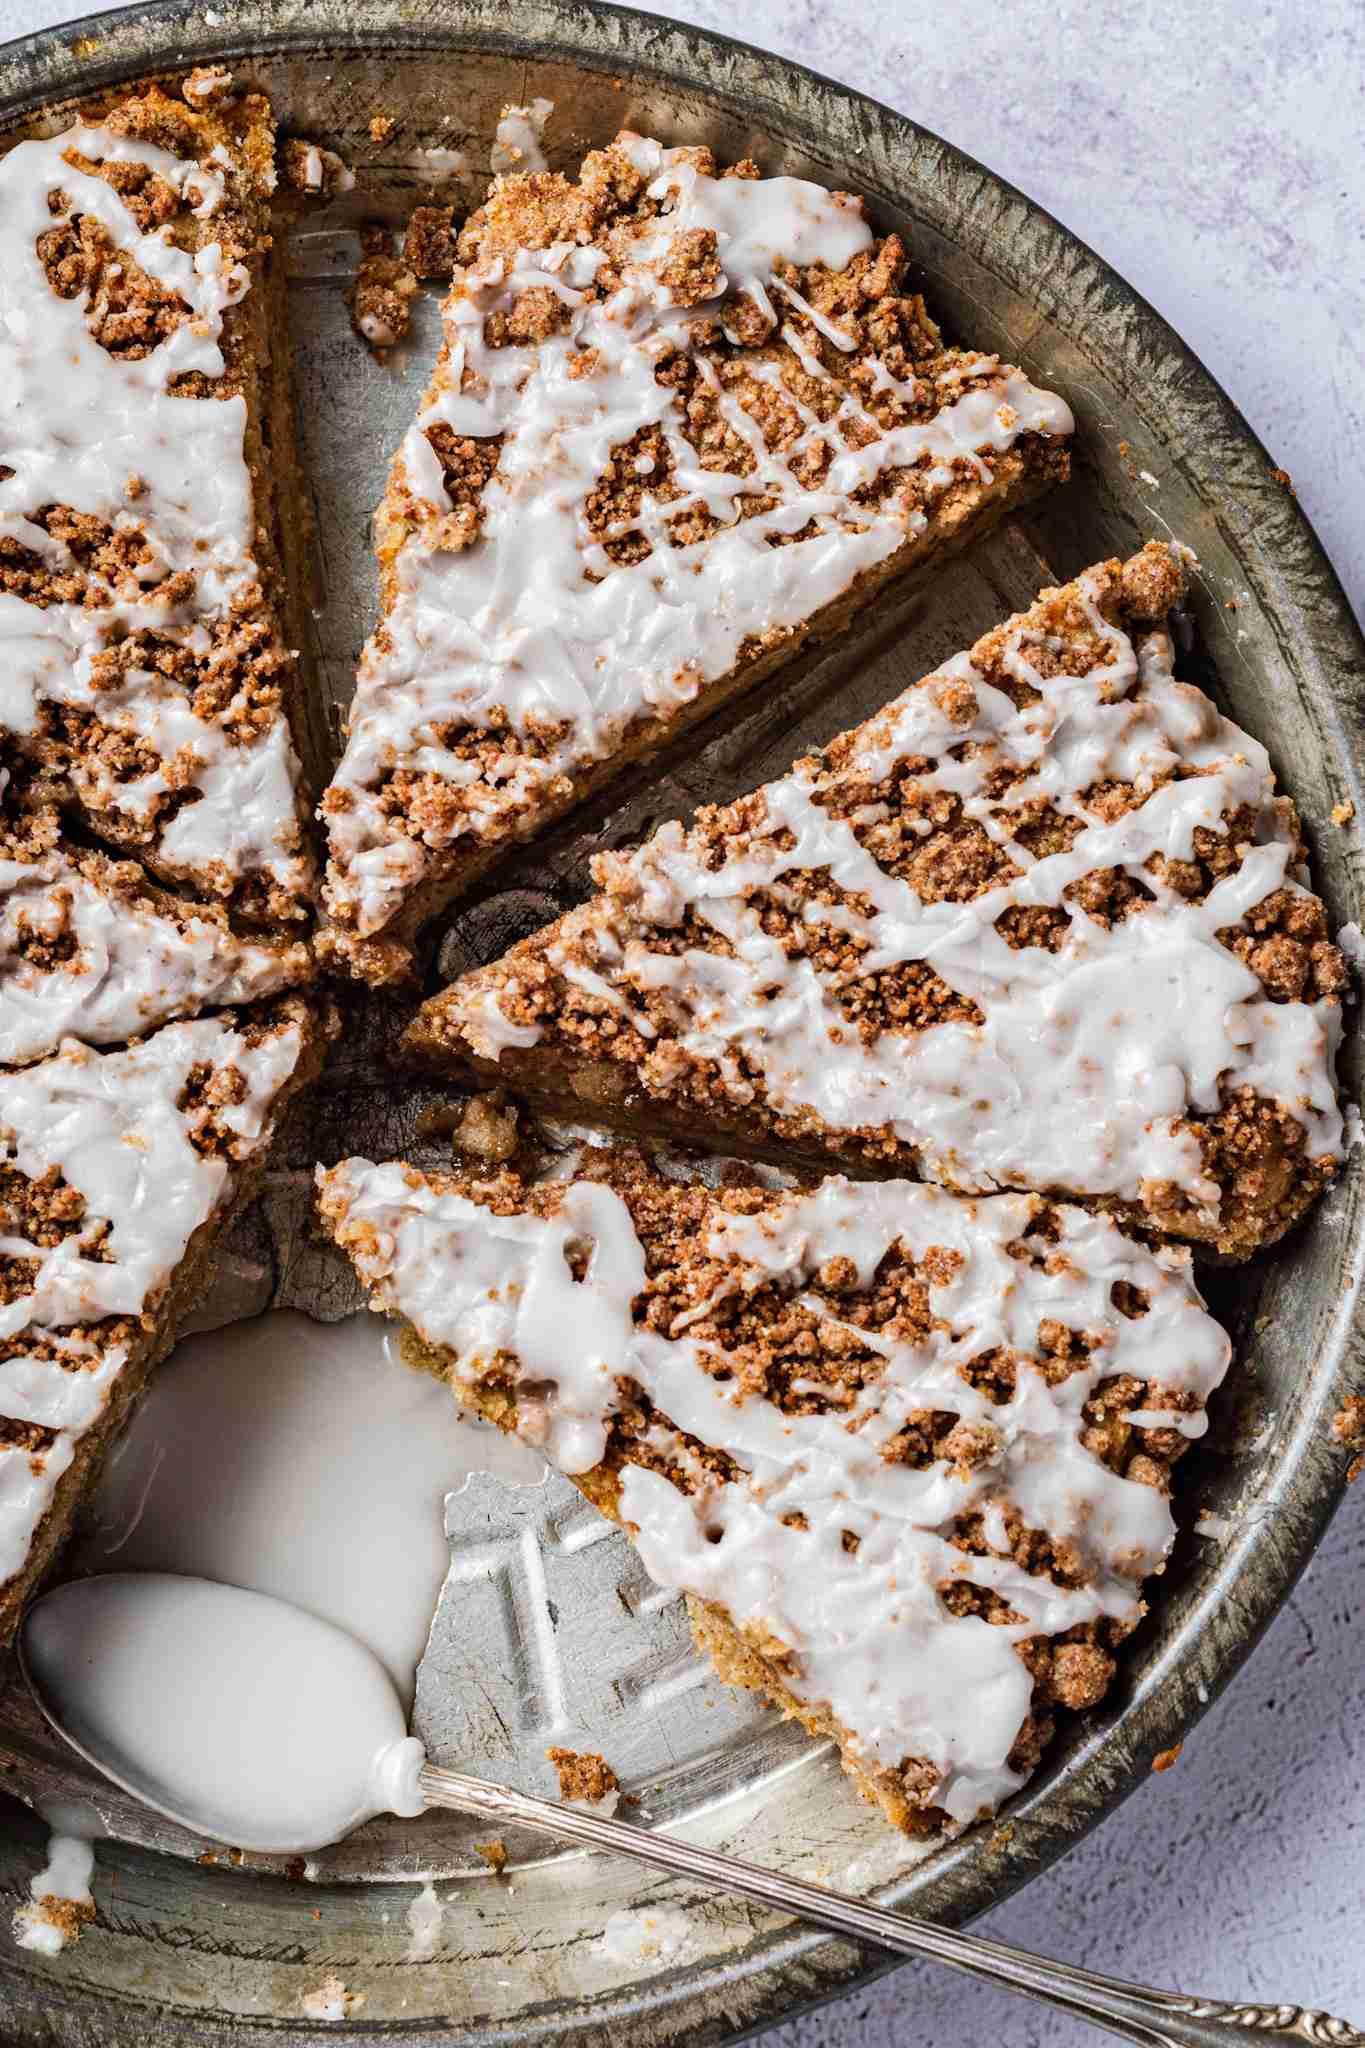 Healthy Gluten Free Banana Coffee Crumb Cake